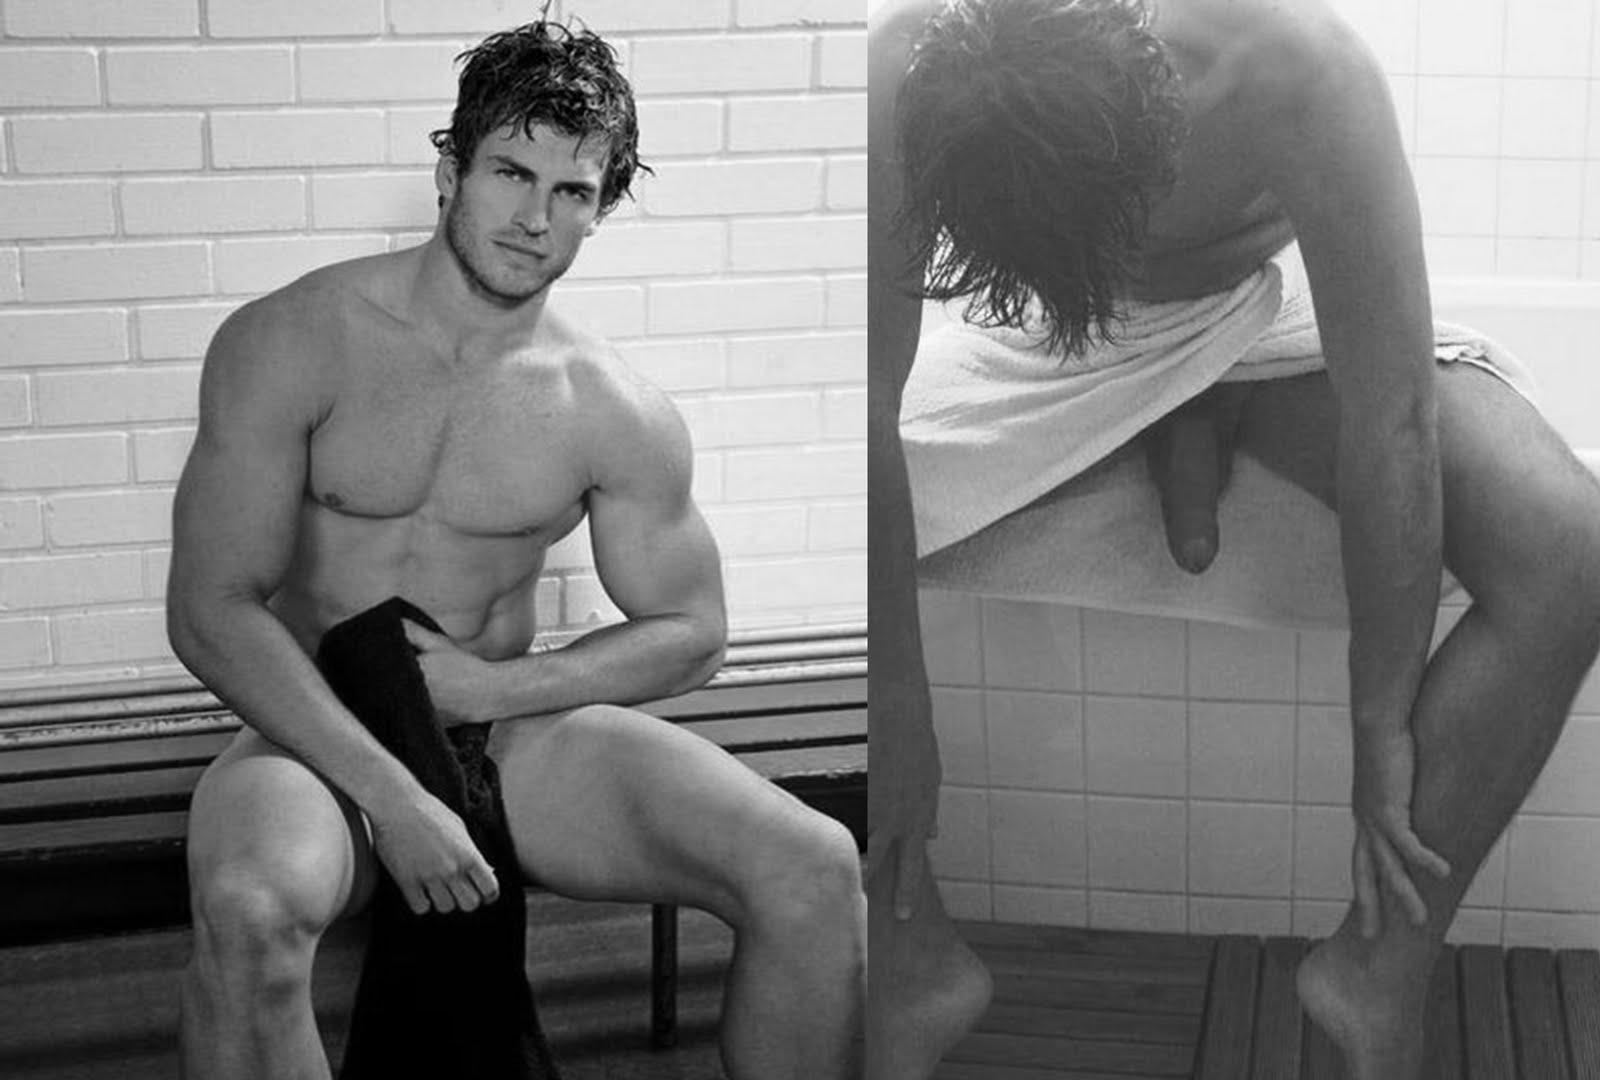 sexy-nude-men-in-sauna-bbw-porn-mp-torrent-video